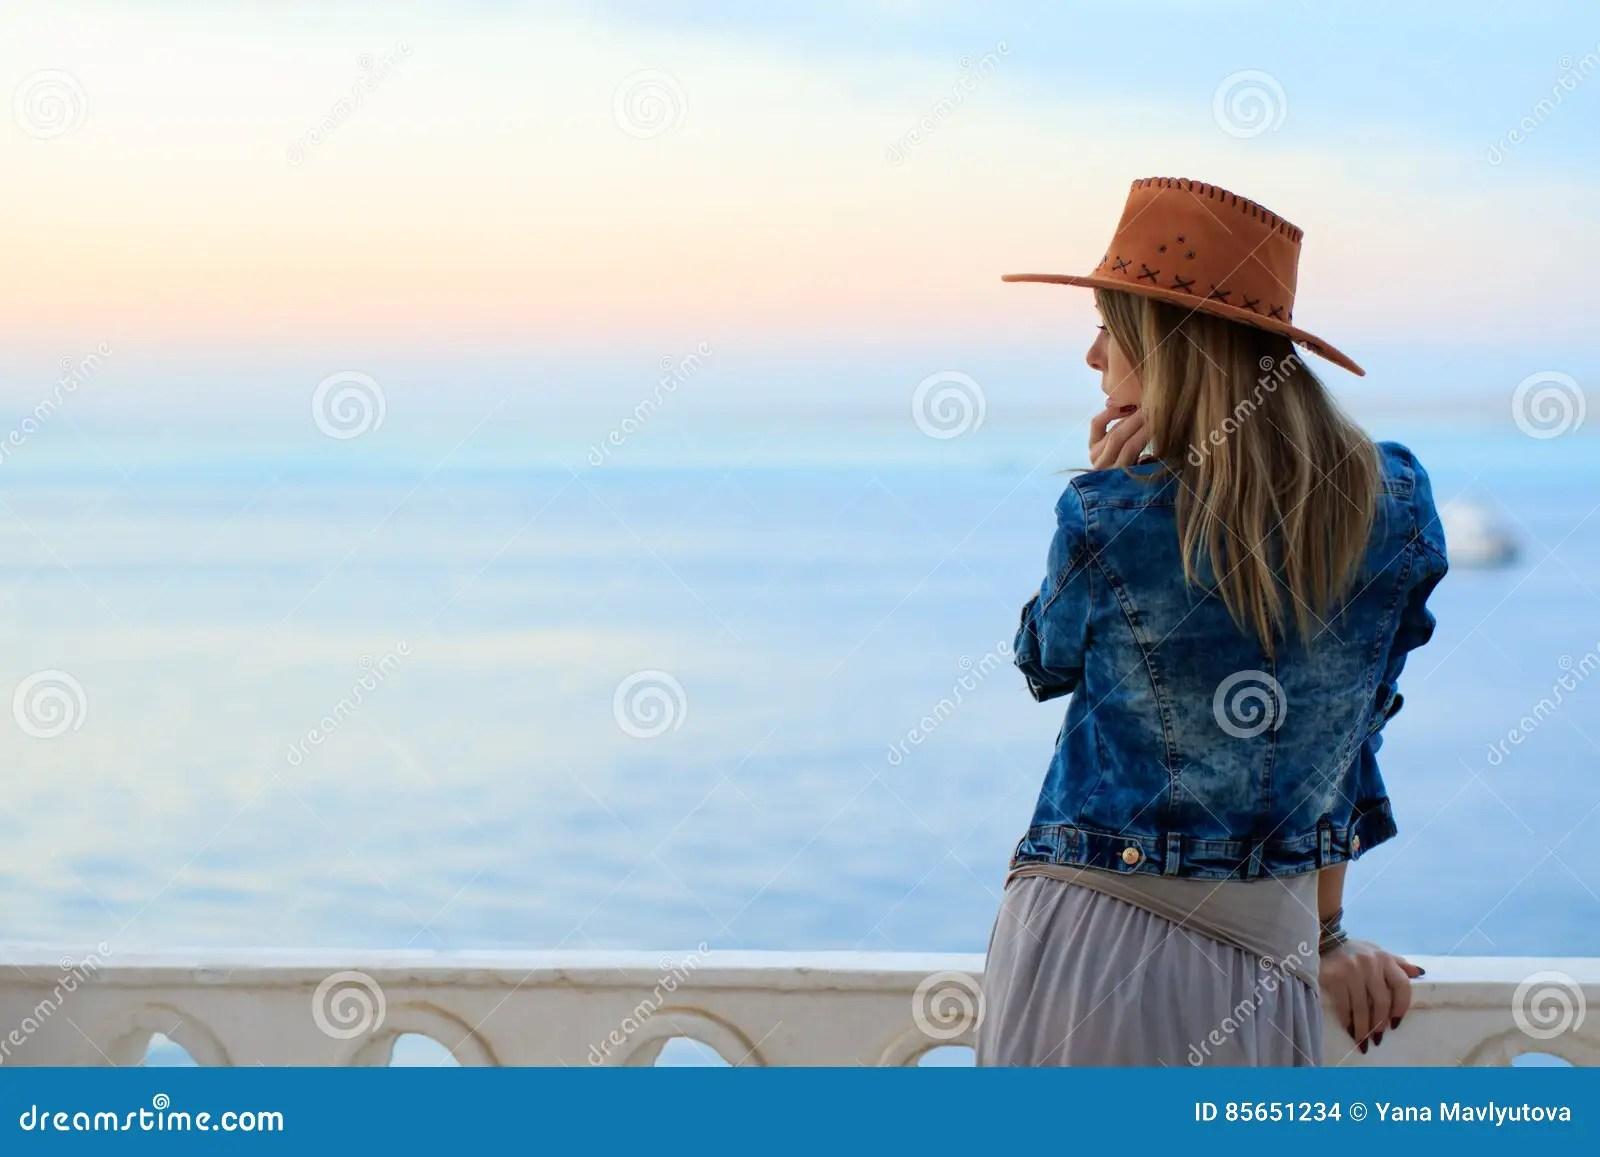 Wild West Sunset Background Stock Images